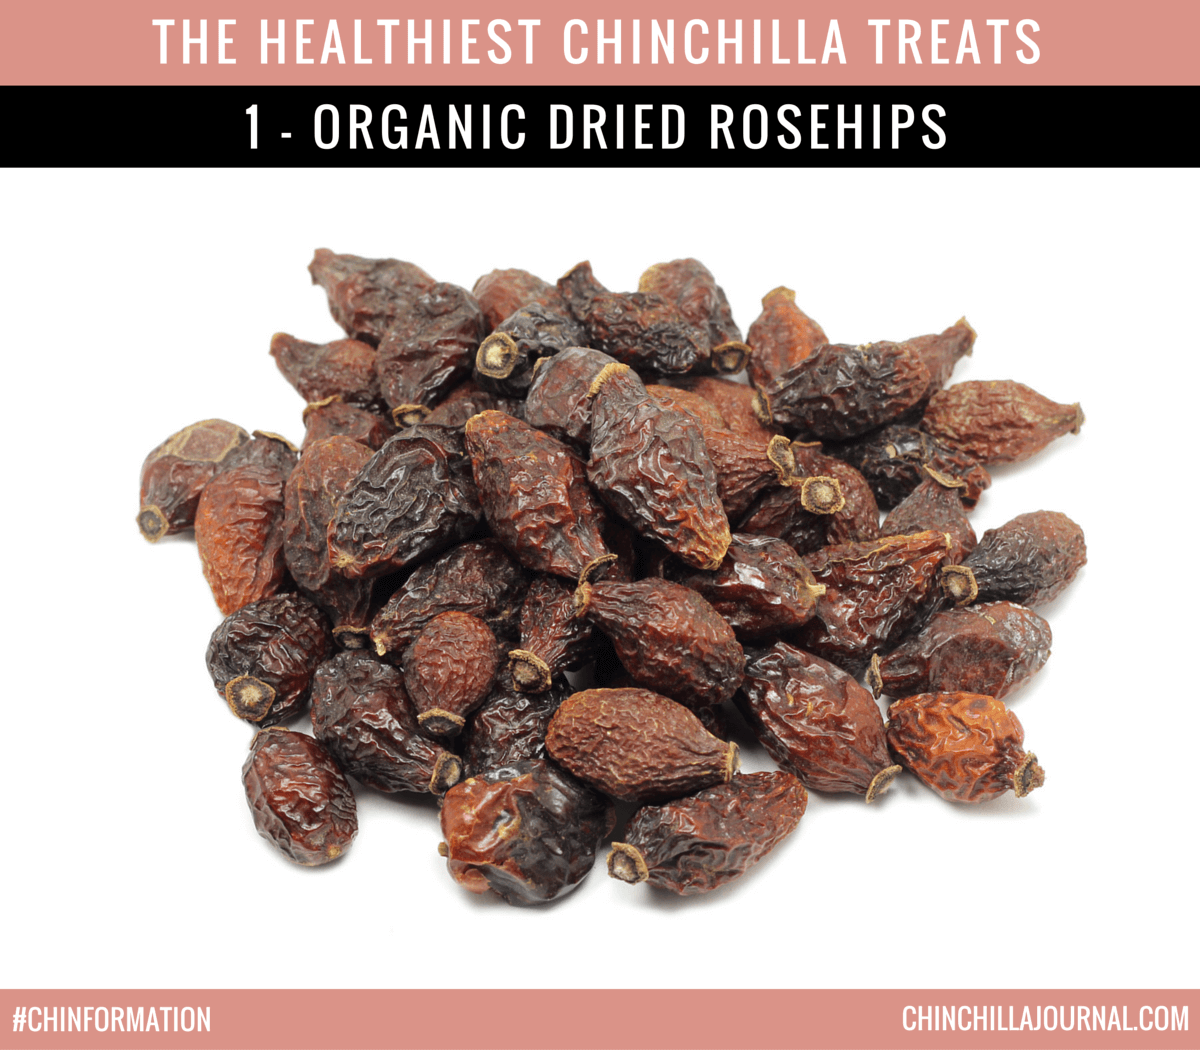 The Healthiest Chinchilla Treats - 1 - Organic Dried Rosehips